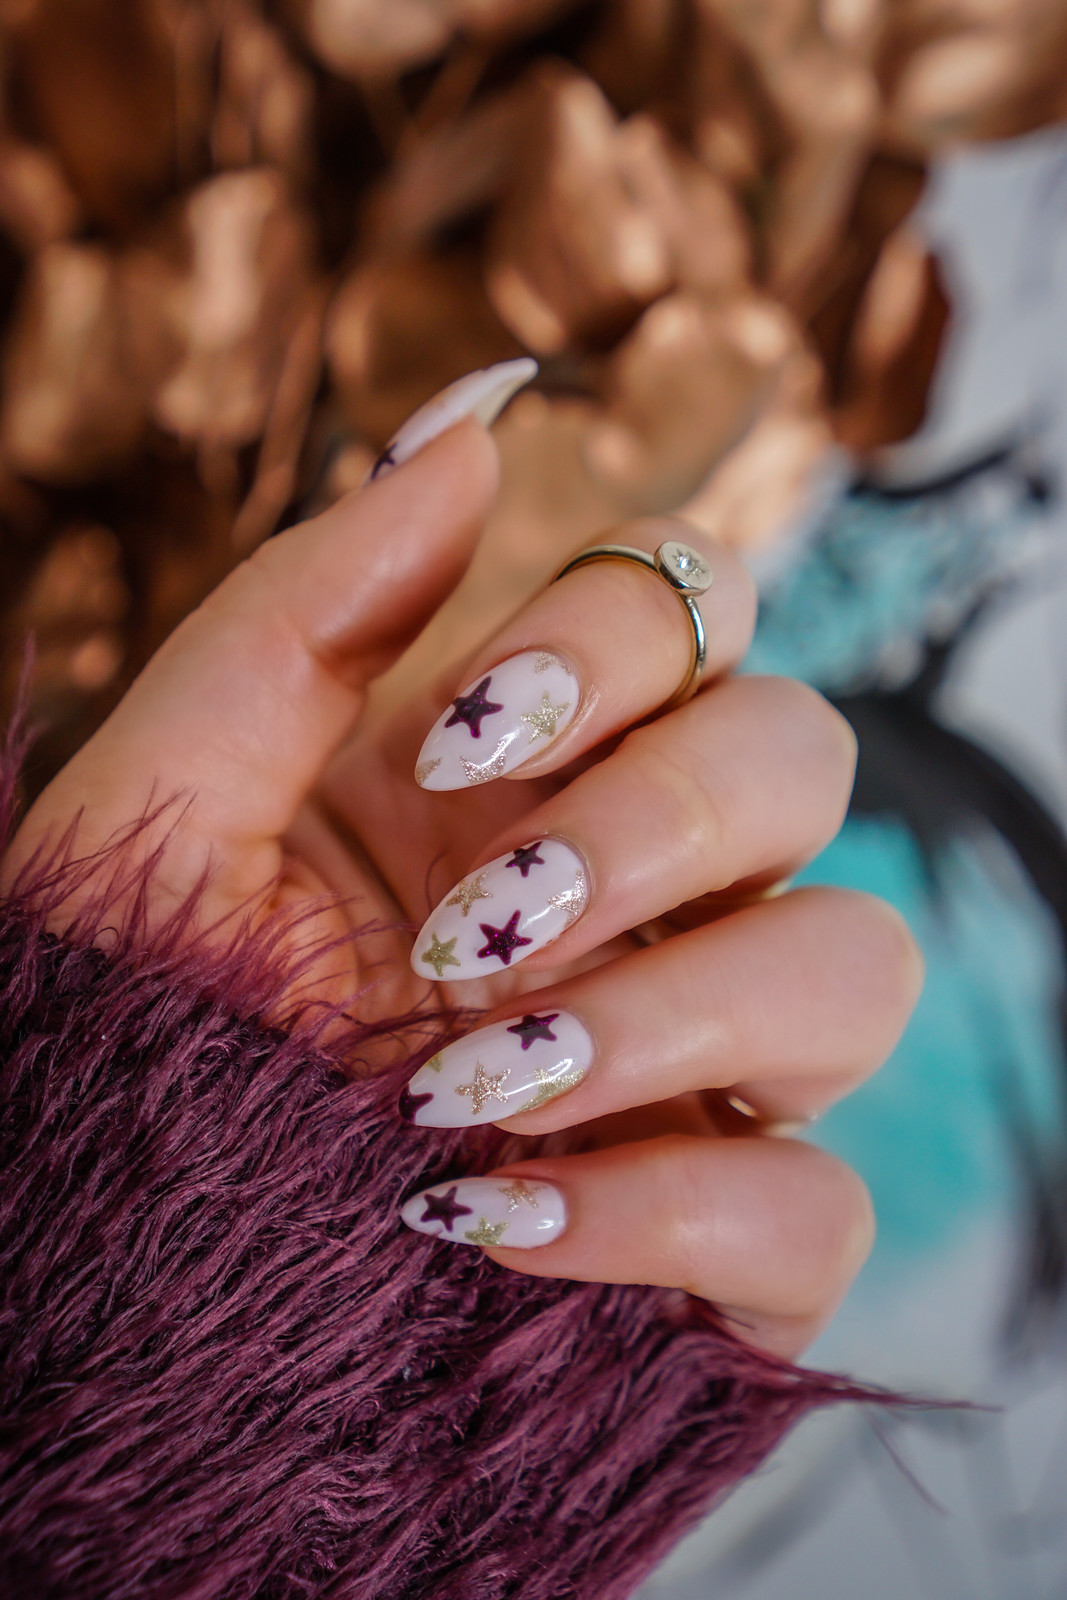 Manicure of the Month: Sparkly Star Nails | Star Manicure | Gold Rose Gold & Burgundy Stars | Pink Star Mani | Almond Shape Nails | UV Gel | Hard Gel | Nail Art Inspiration | Nail Design